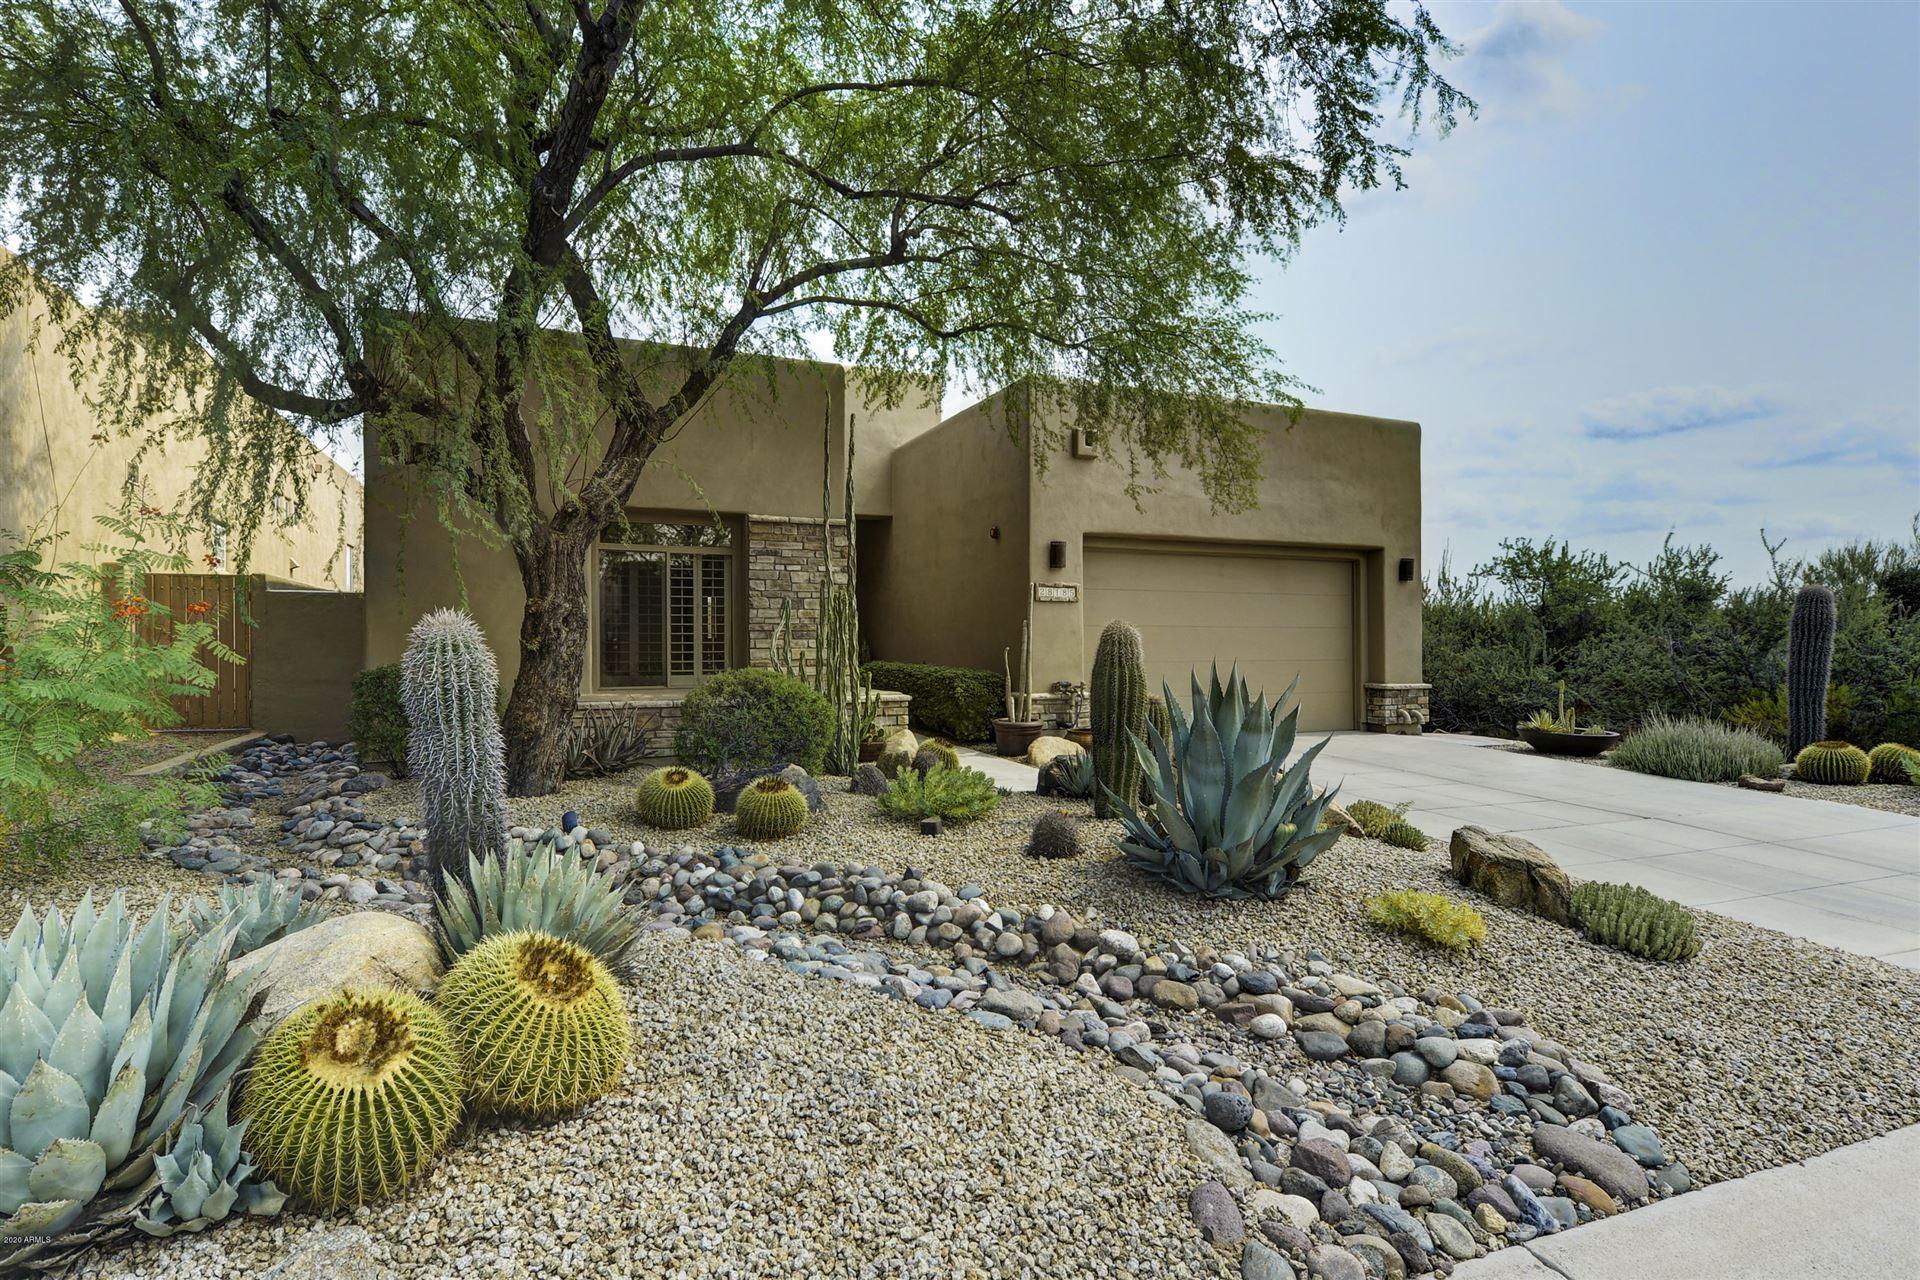 28185 N 108TH Way, Scottsdale, AZ 85262 - MLS#: 6133755